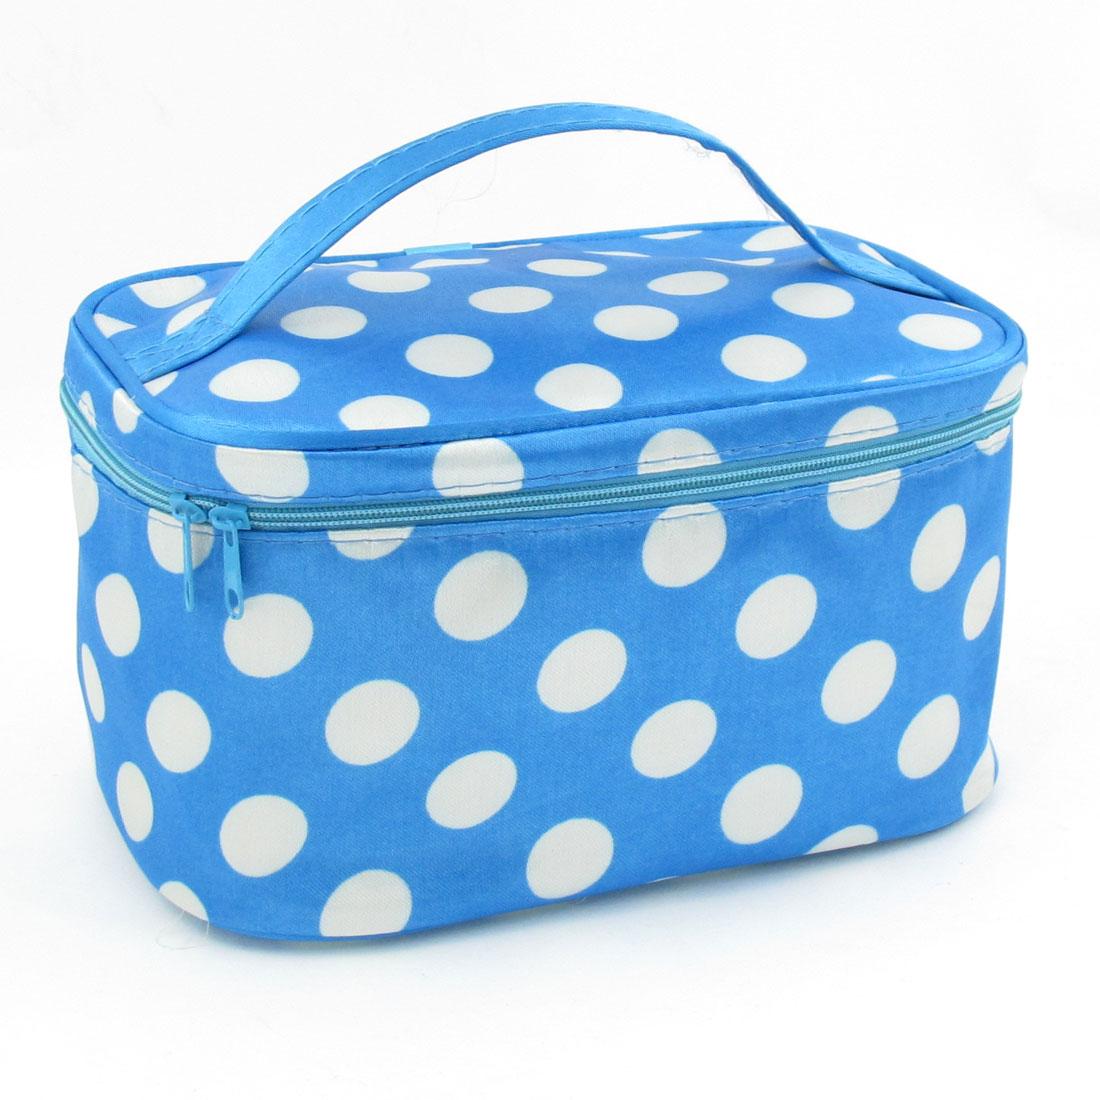 Travel White Dot Print Zipper Closure Rectangle Cosmetic Makeup Bag Blue